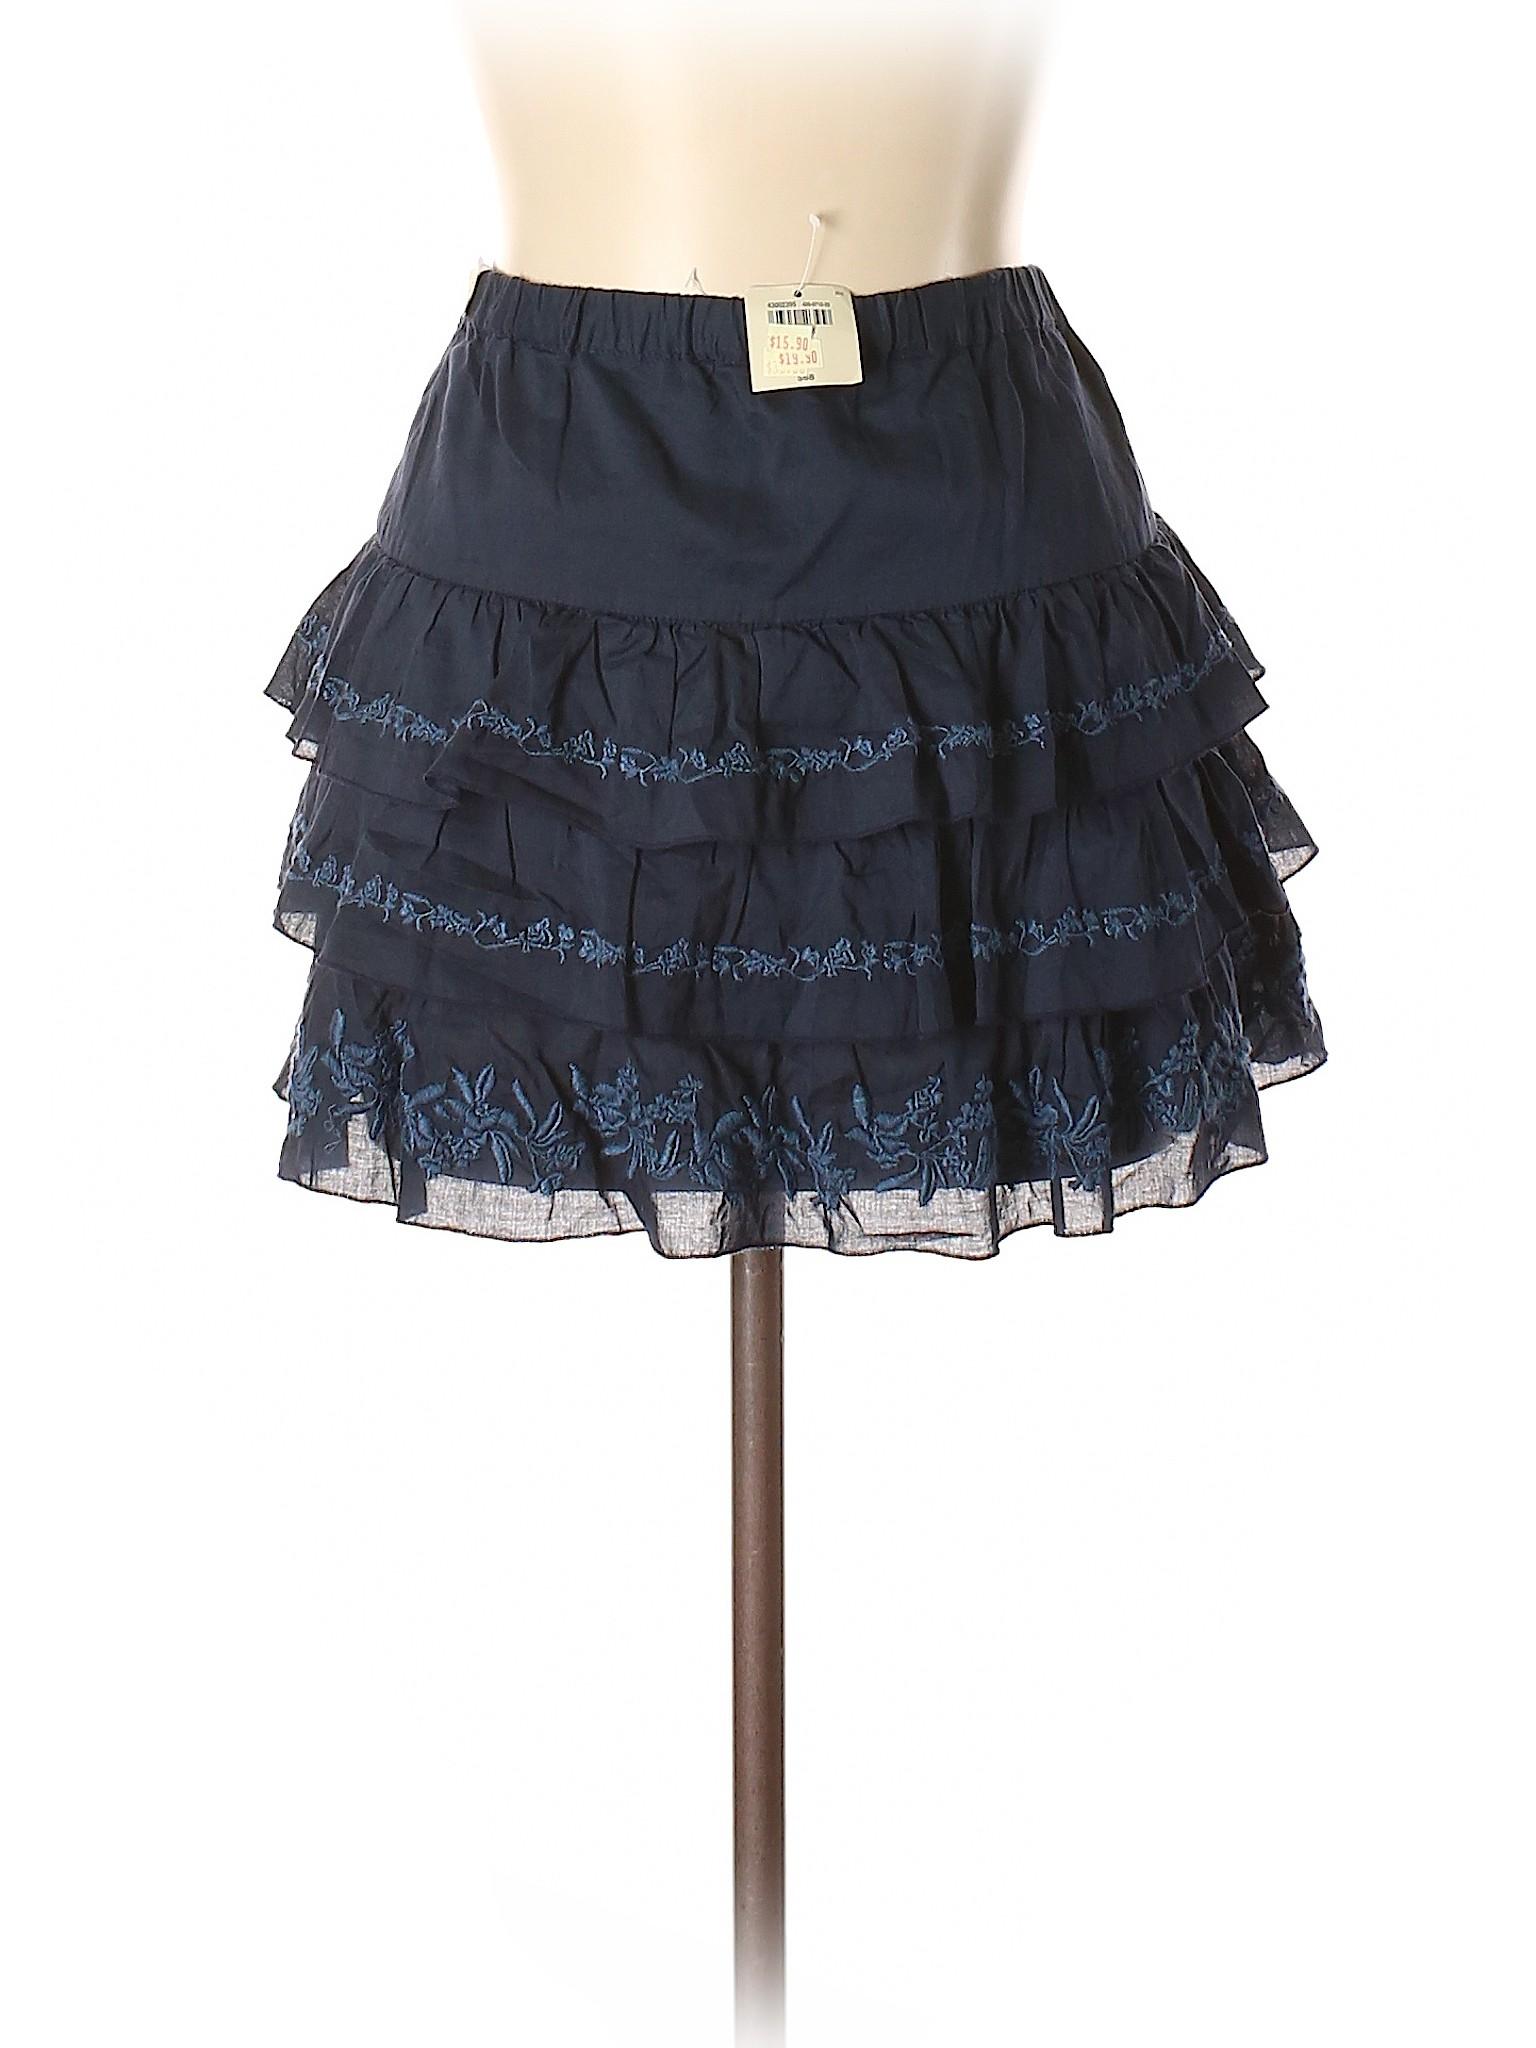 925 Casual Skirt No Ruehl Boutique leisure qzZFtt